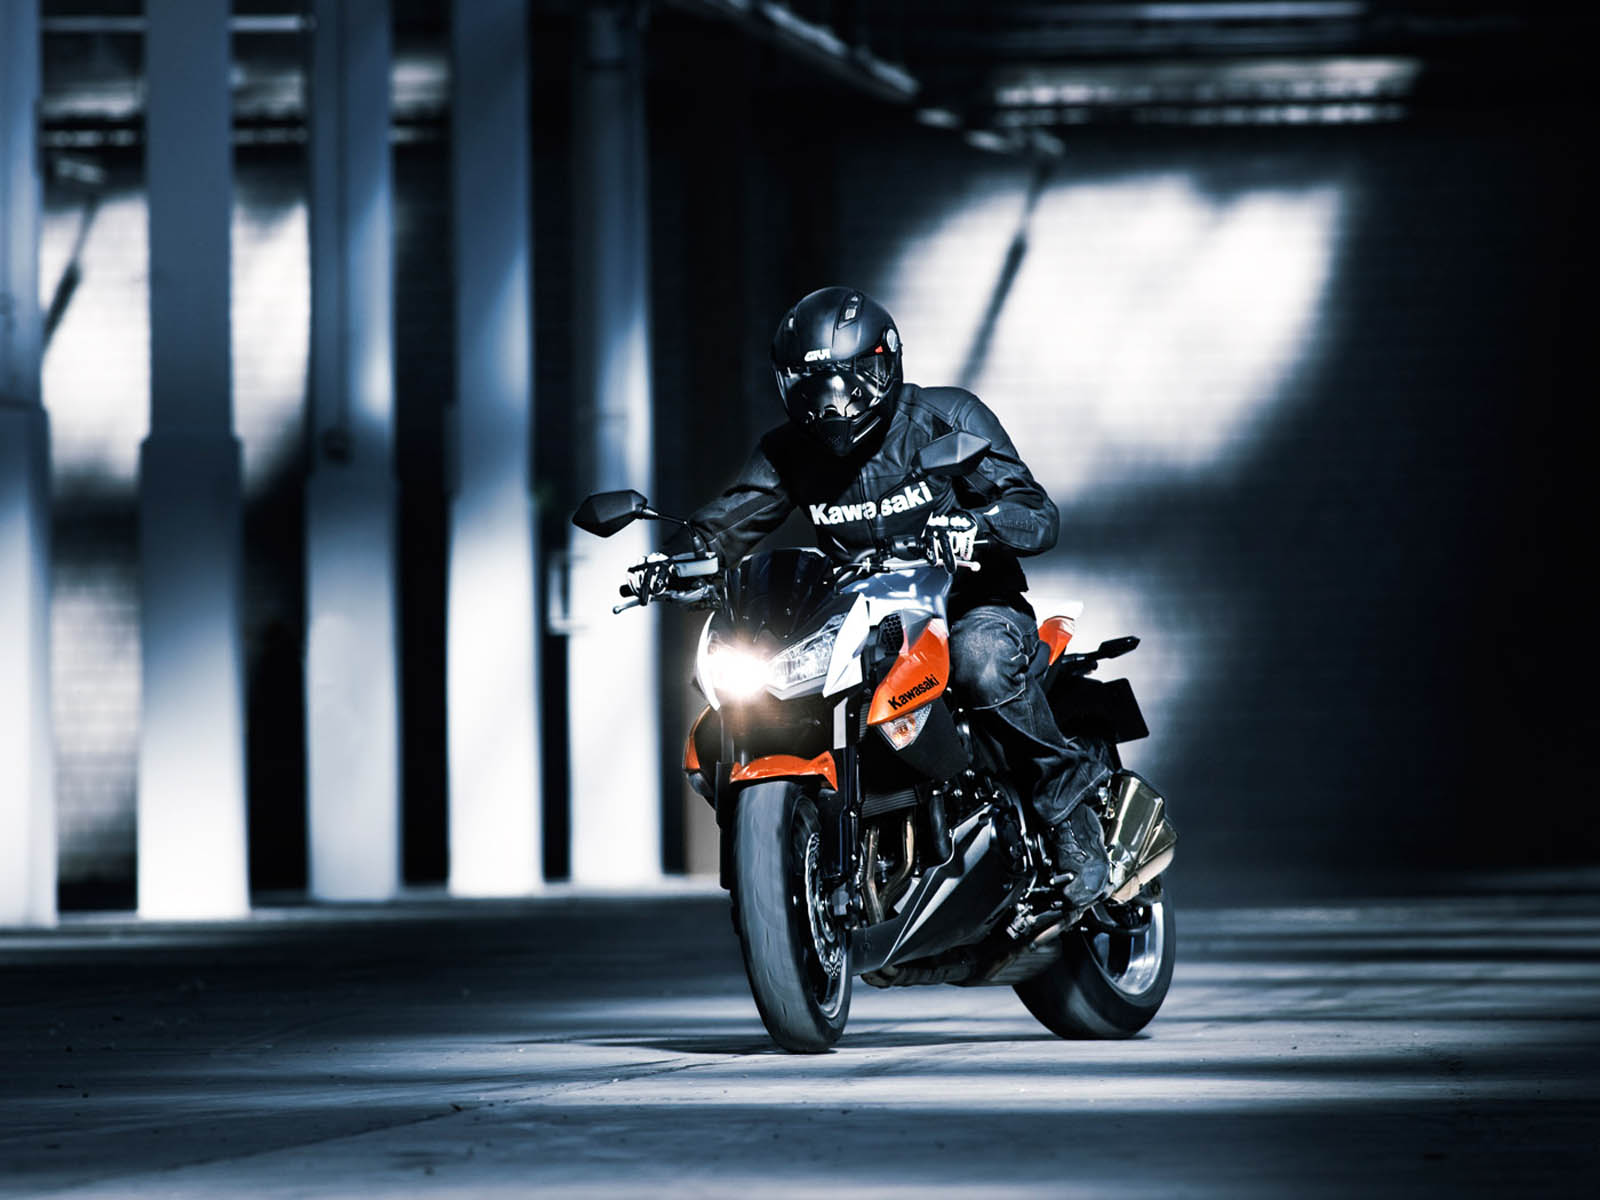 Free Download Wallpaper Naruto Shippuden 3d Wallpapers Bike Rider